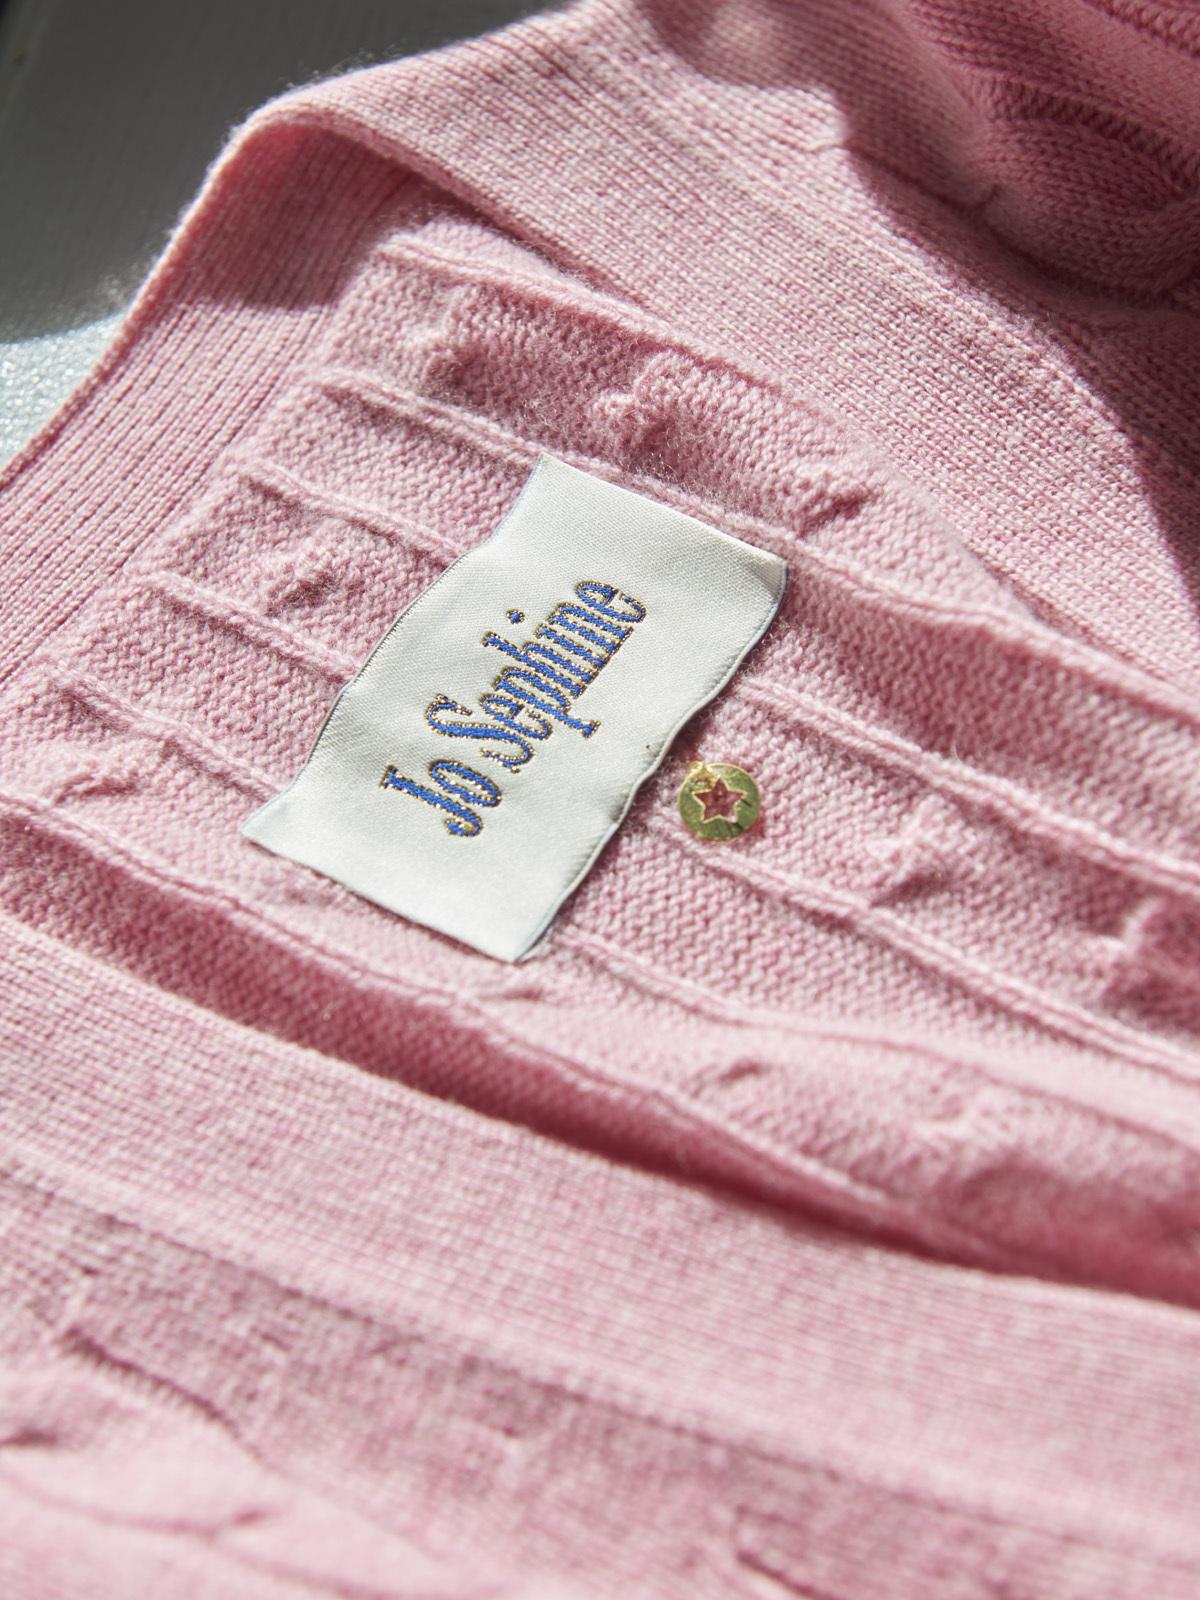 Detalle de una prenda Jo Sephine.